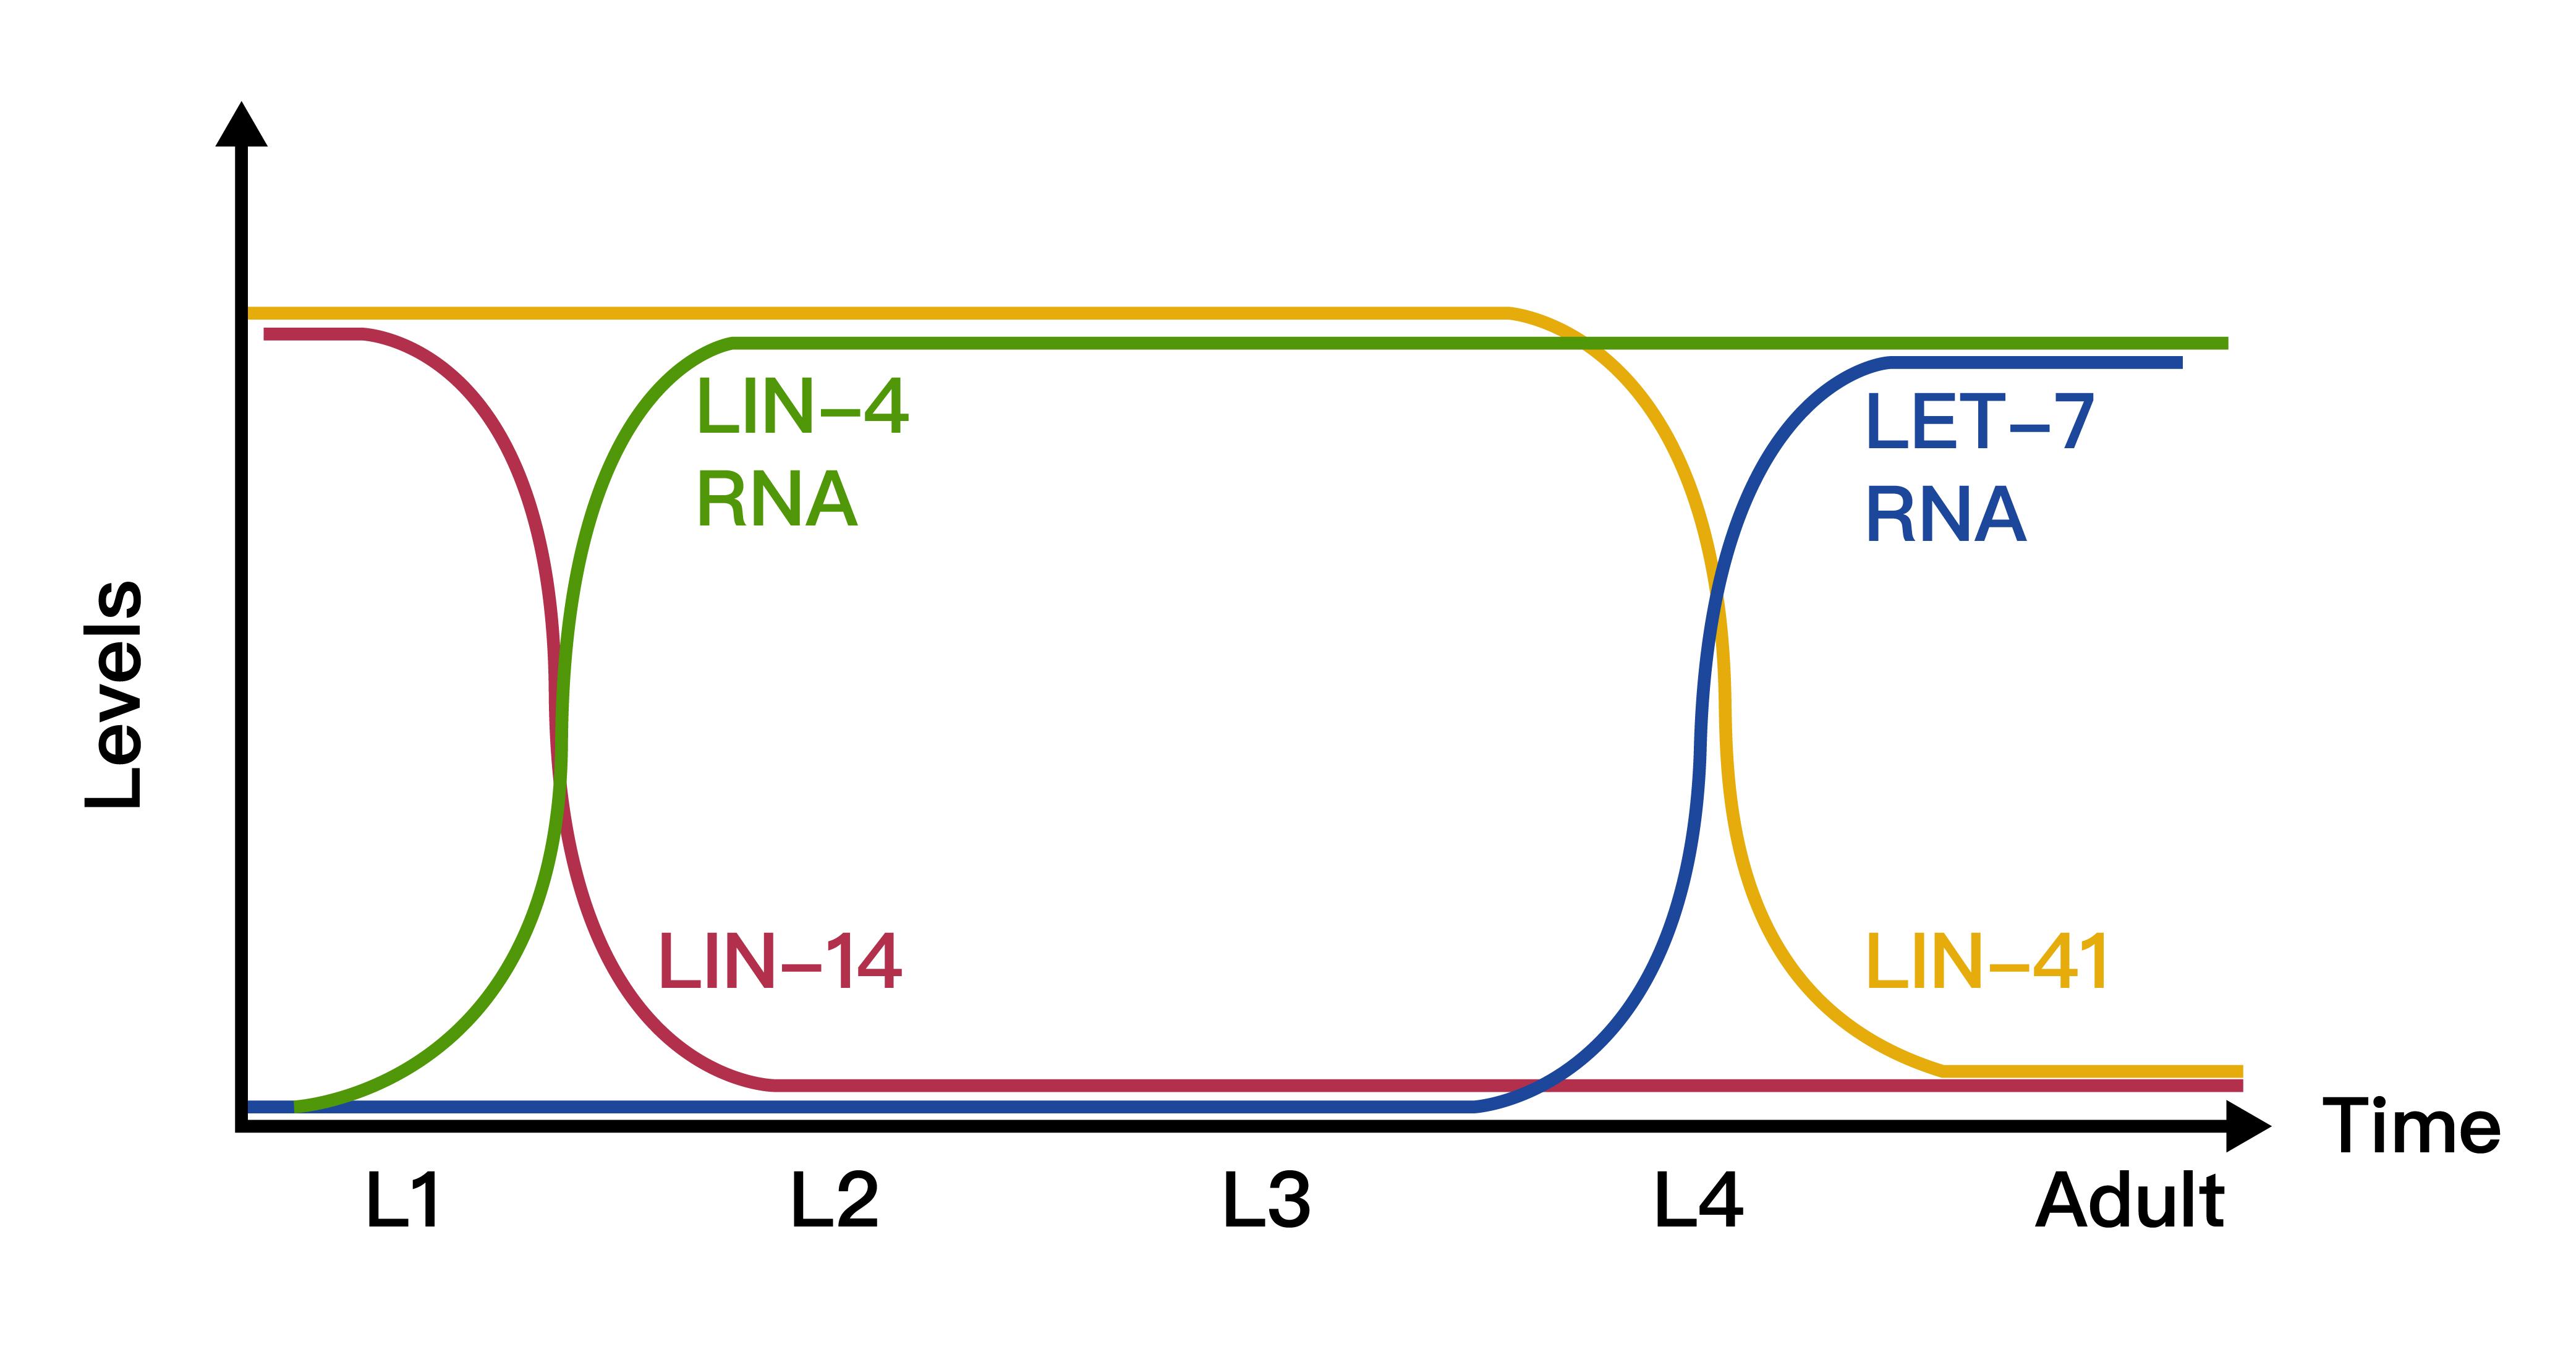 miRNAs lin-4 和 let-7 調控標靶基因的時間關係,貫穿線蟲的年幼時期到成蟲。 資料來源│Vella, M.C., & Slack, F.J. (2005). C. elegans microRNAs. WormBook : the online review of C. elegans biology, 1-9.